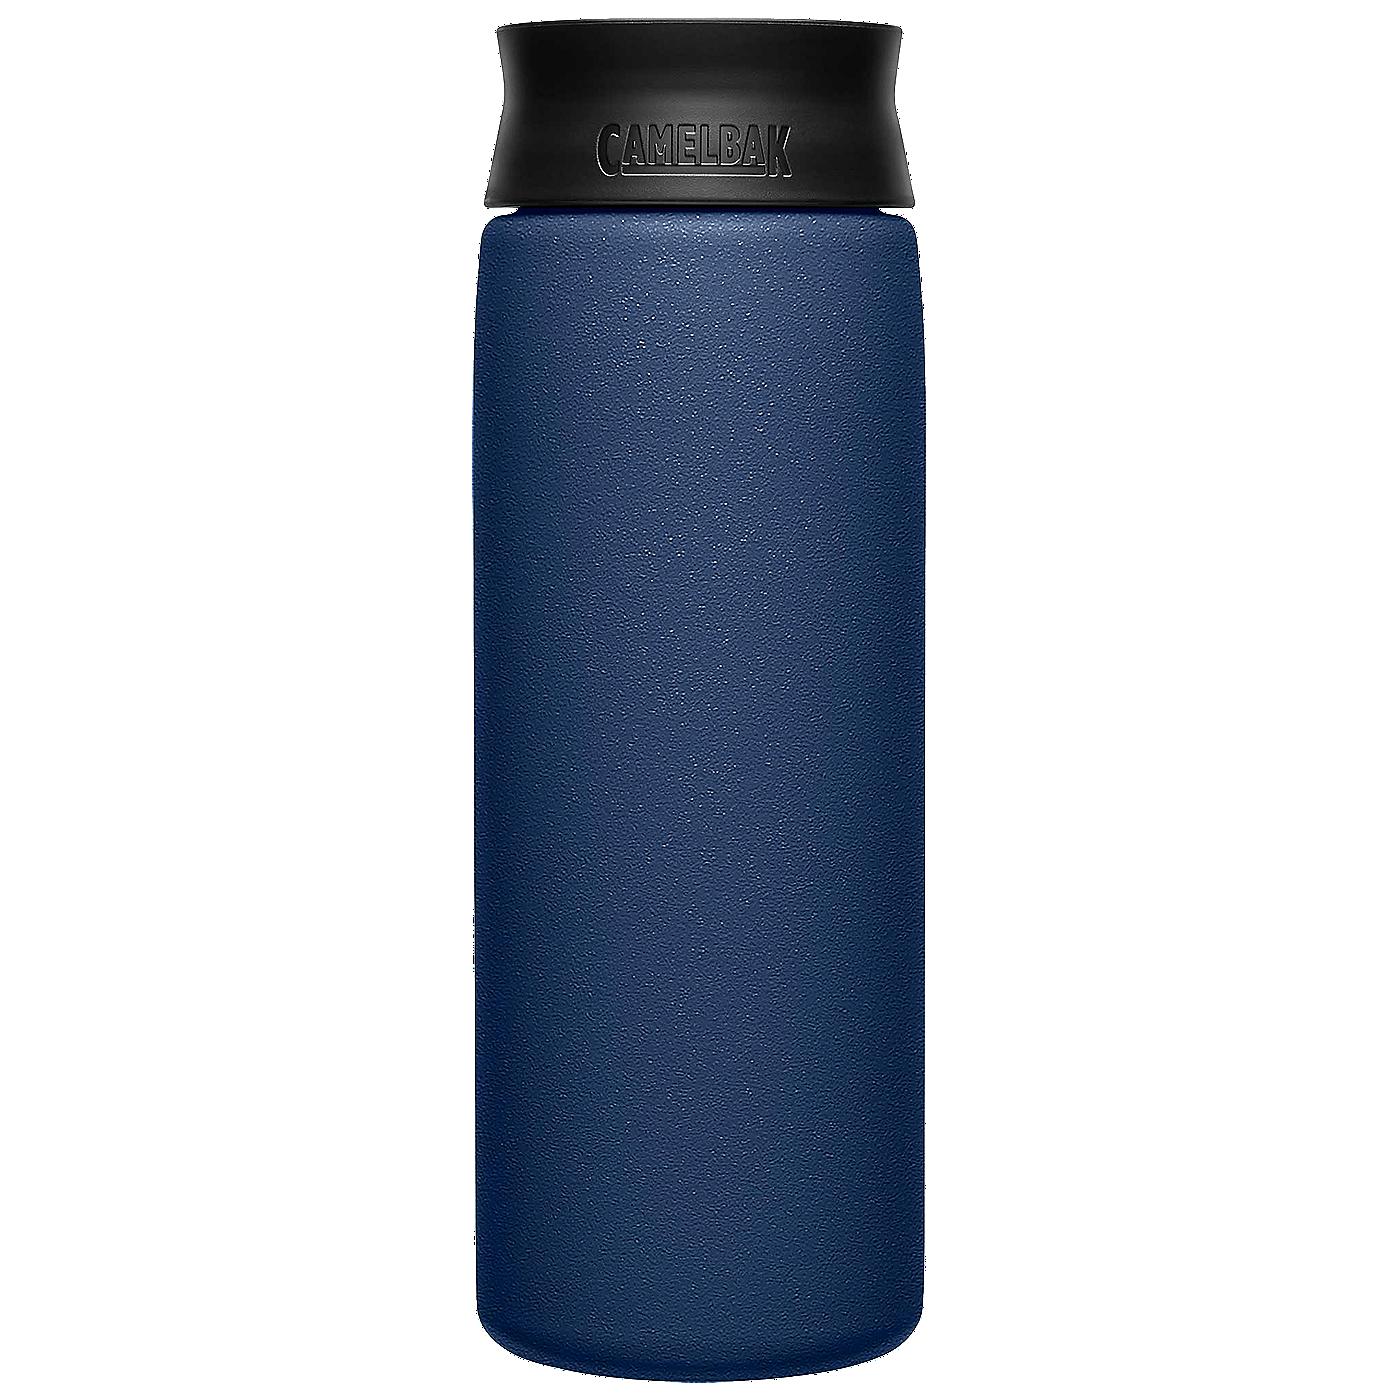 Camelbak Hot Cap 20 Oz. Vacuum Insulated Travel Mug